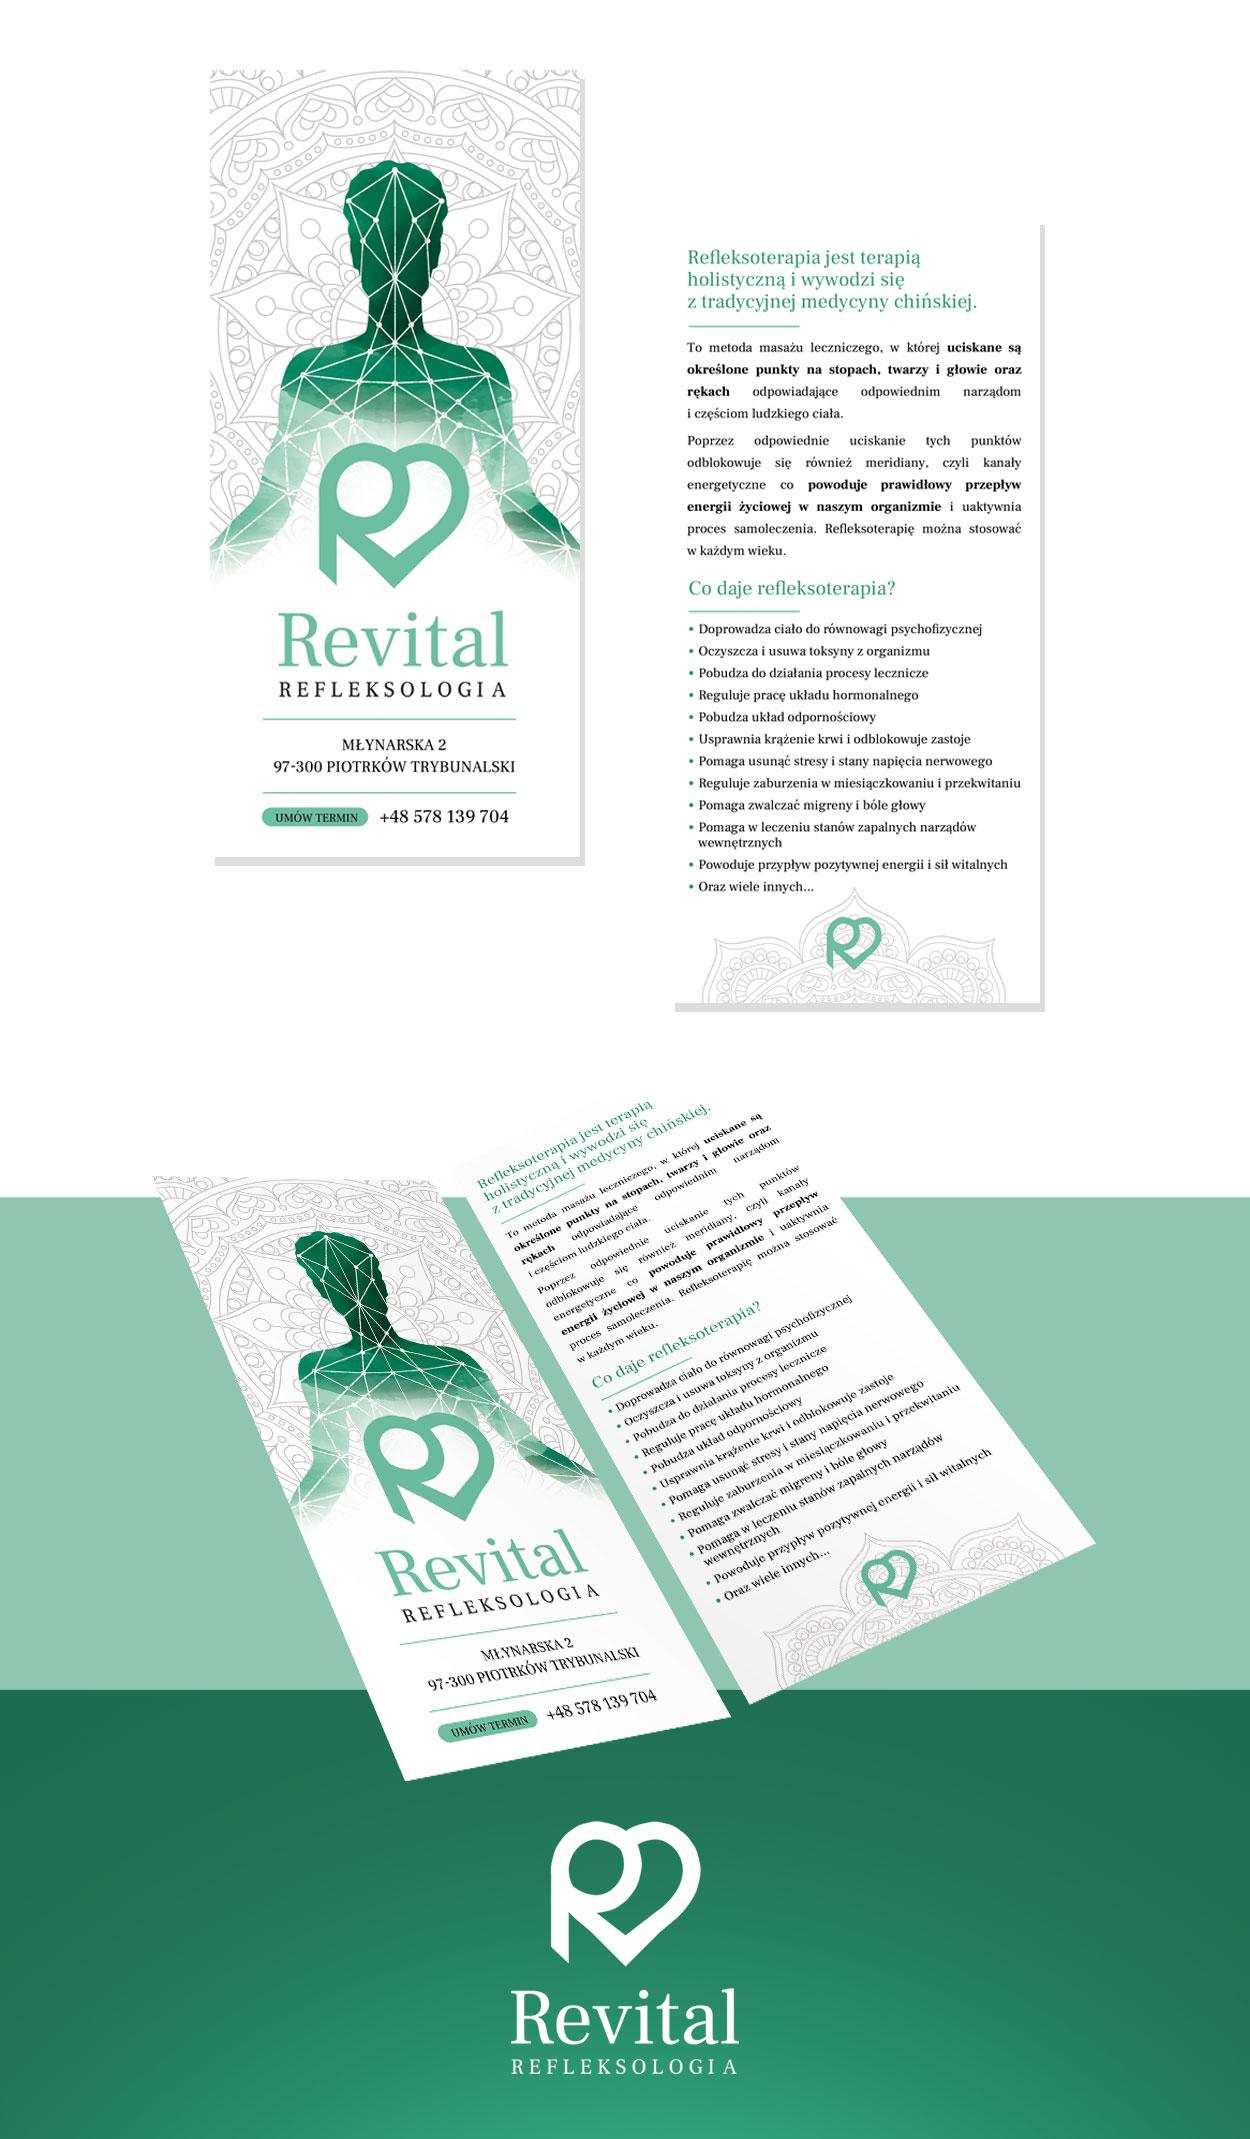 projekt ulotki rekalmowej dl revital refleksologia - Projekt ulotki reklamowej - Revital Refleksologia